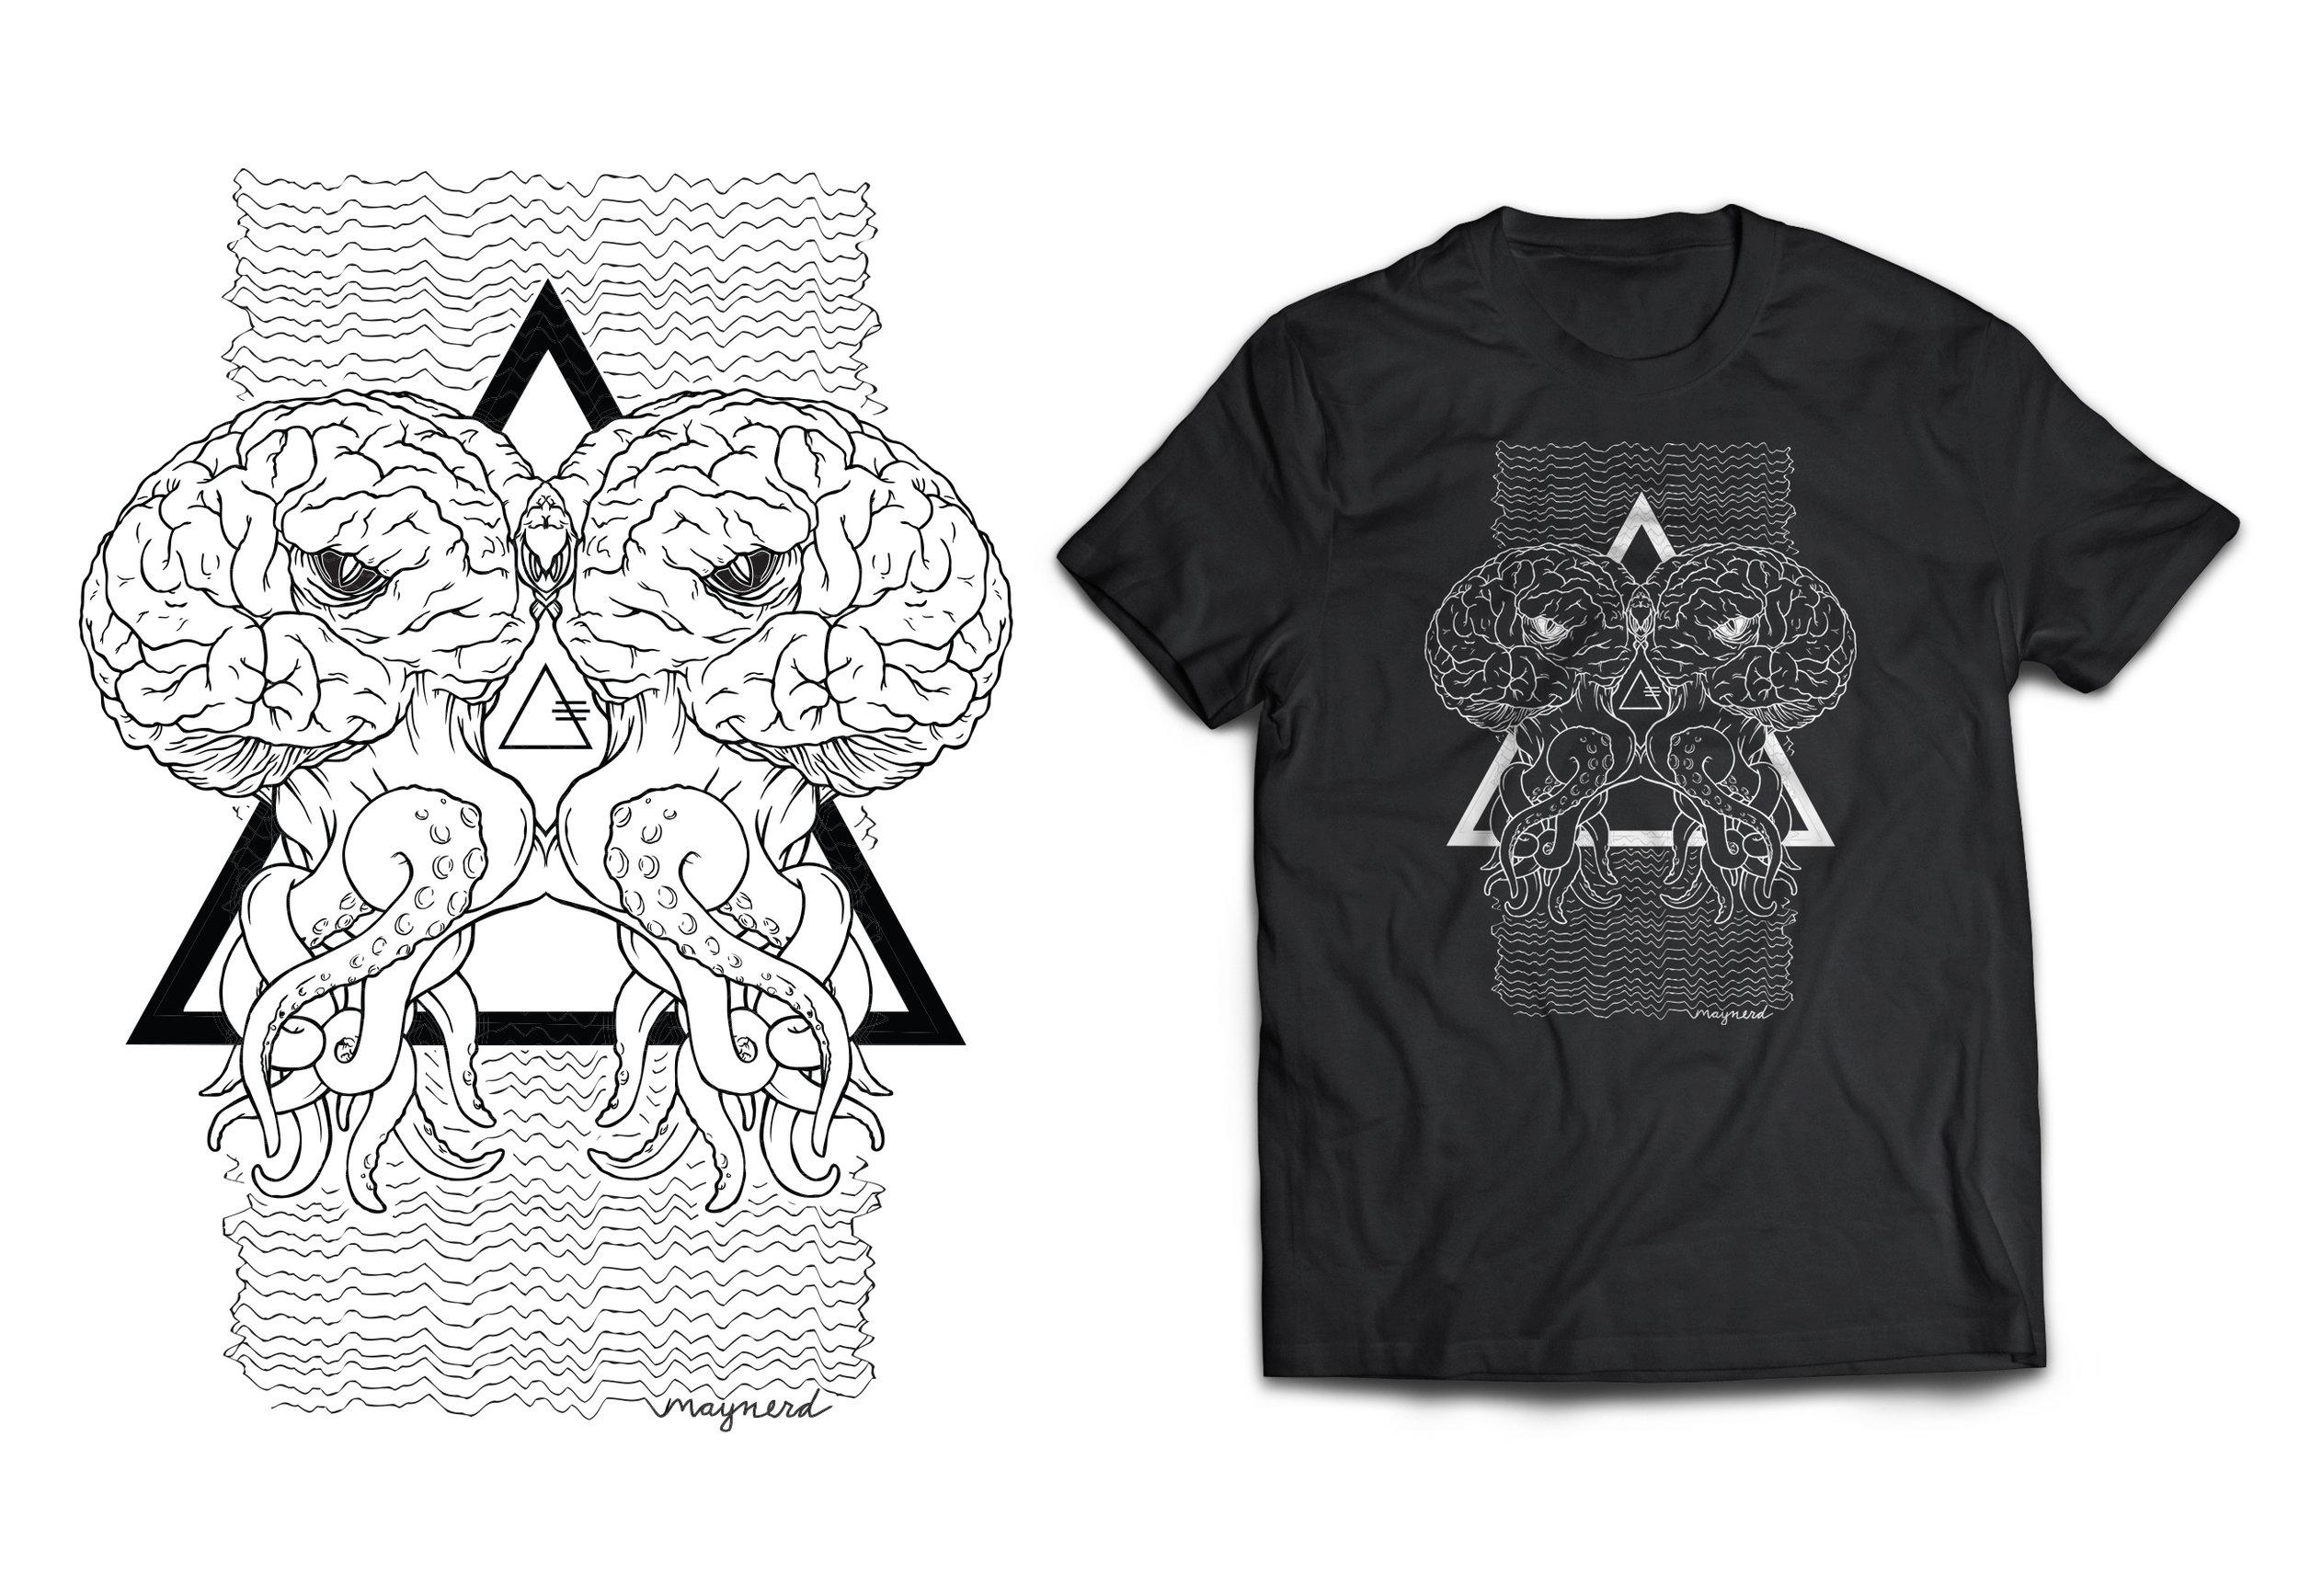 Binary Cephalopod T-Shirt Design